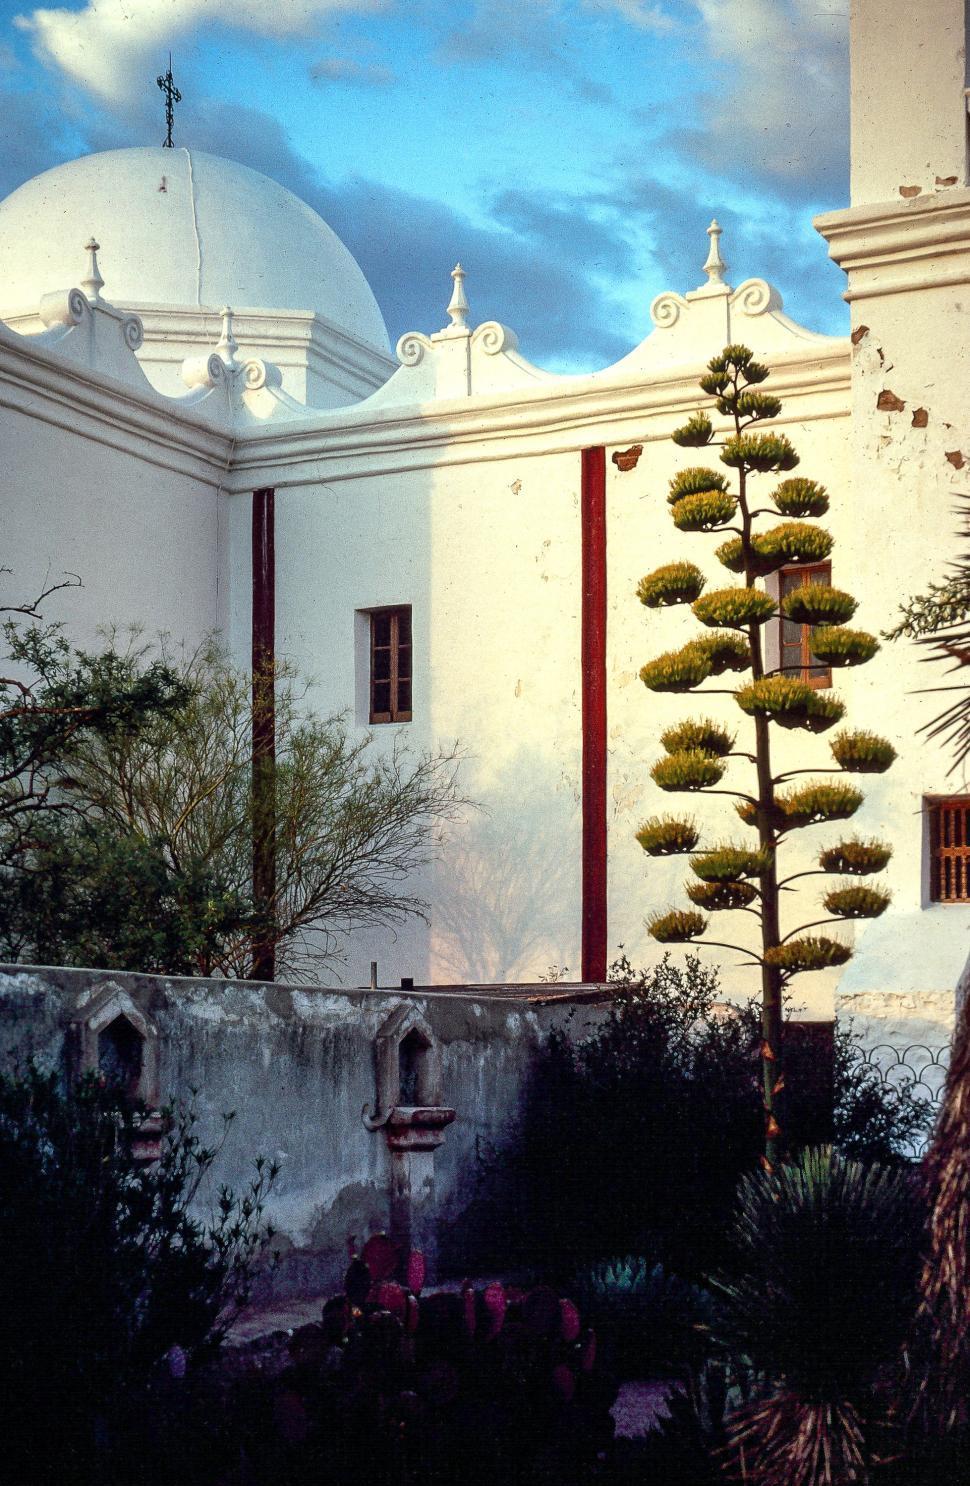 Download Free Stock HD Photo of San Xavier del Bac, Tucson, Arizona, USA Online